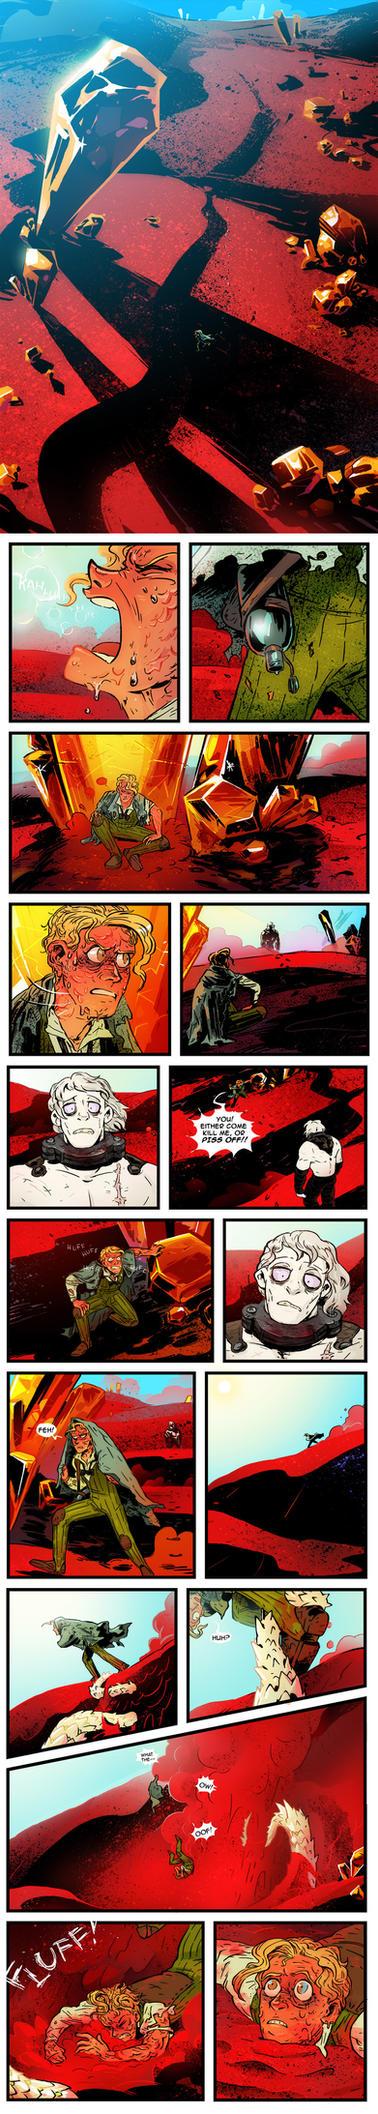 gregor prologue part 1 by NightmareHound